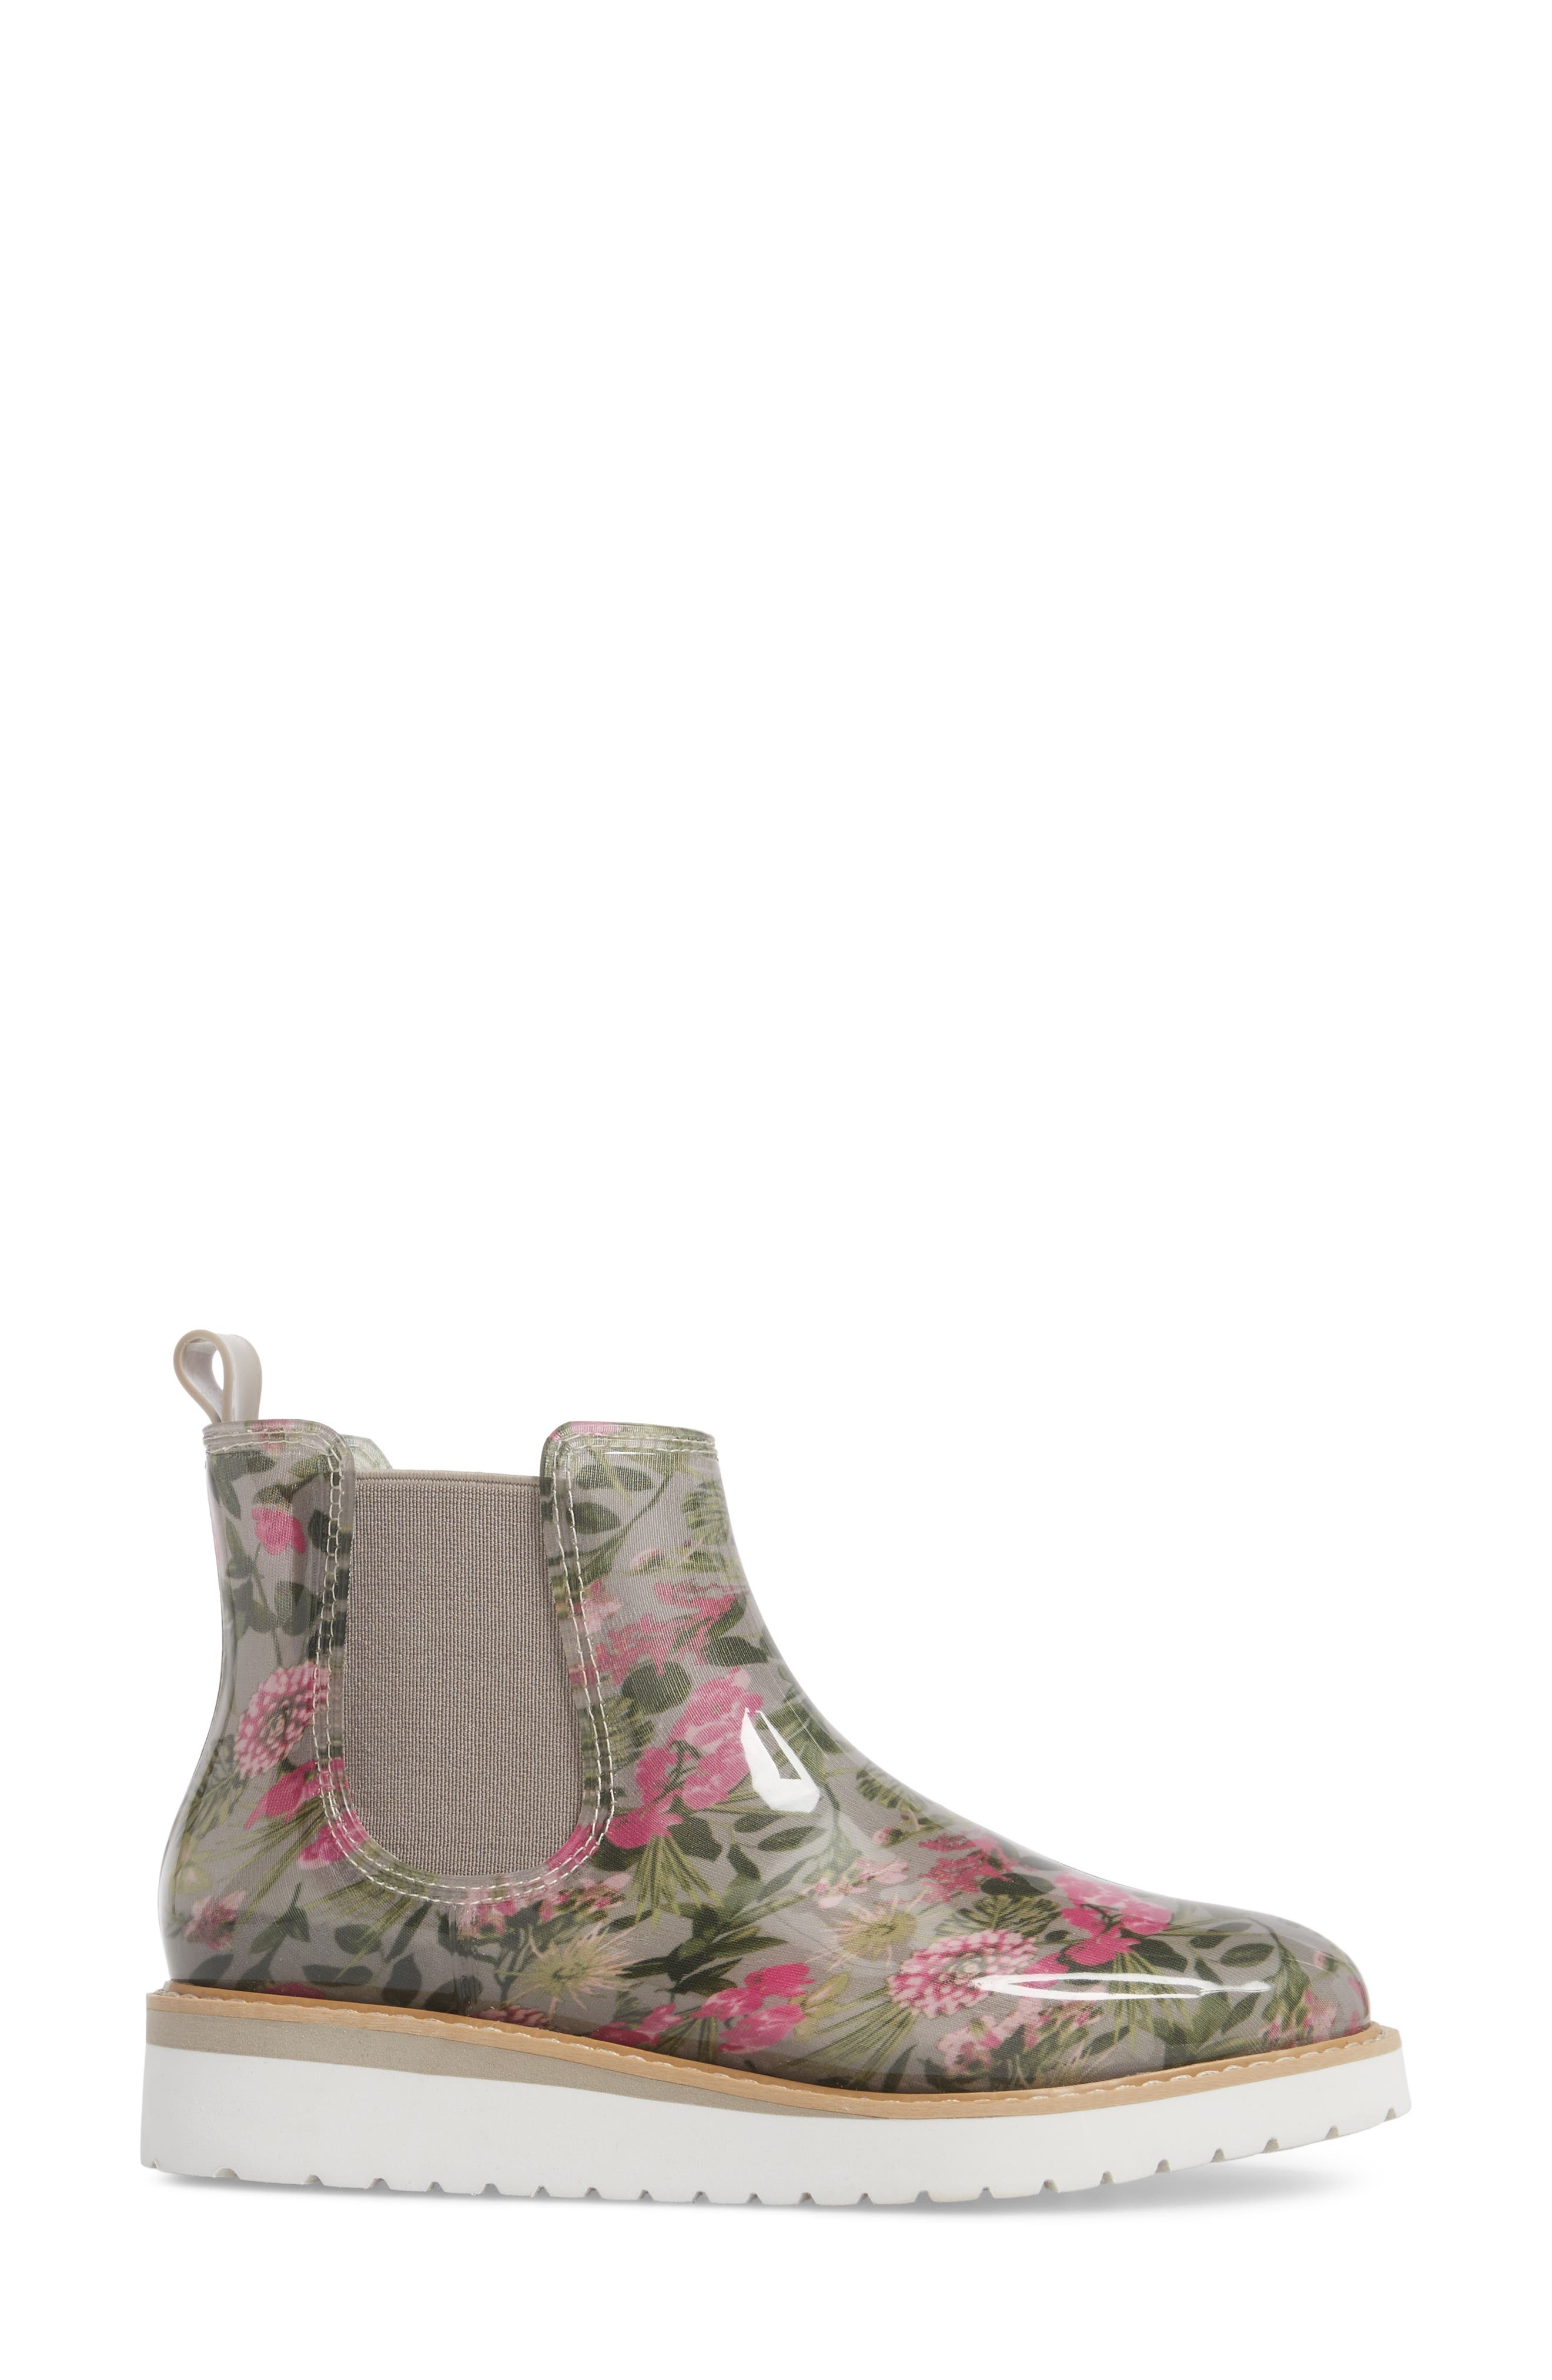 Kensington Chelsea Rain Boot,                             Alternate thumbnail 3, color,                             Tropical Floral